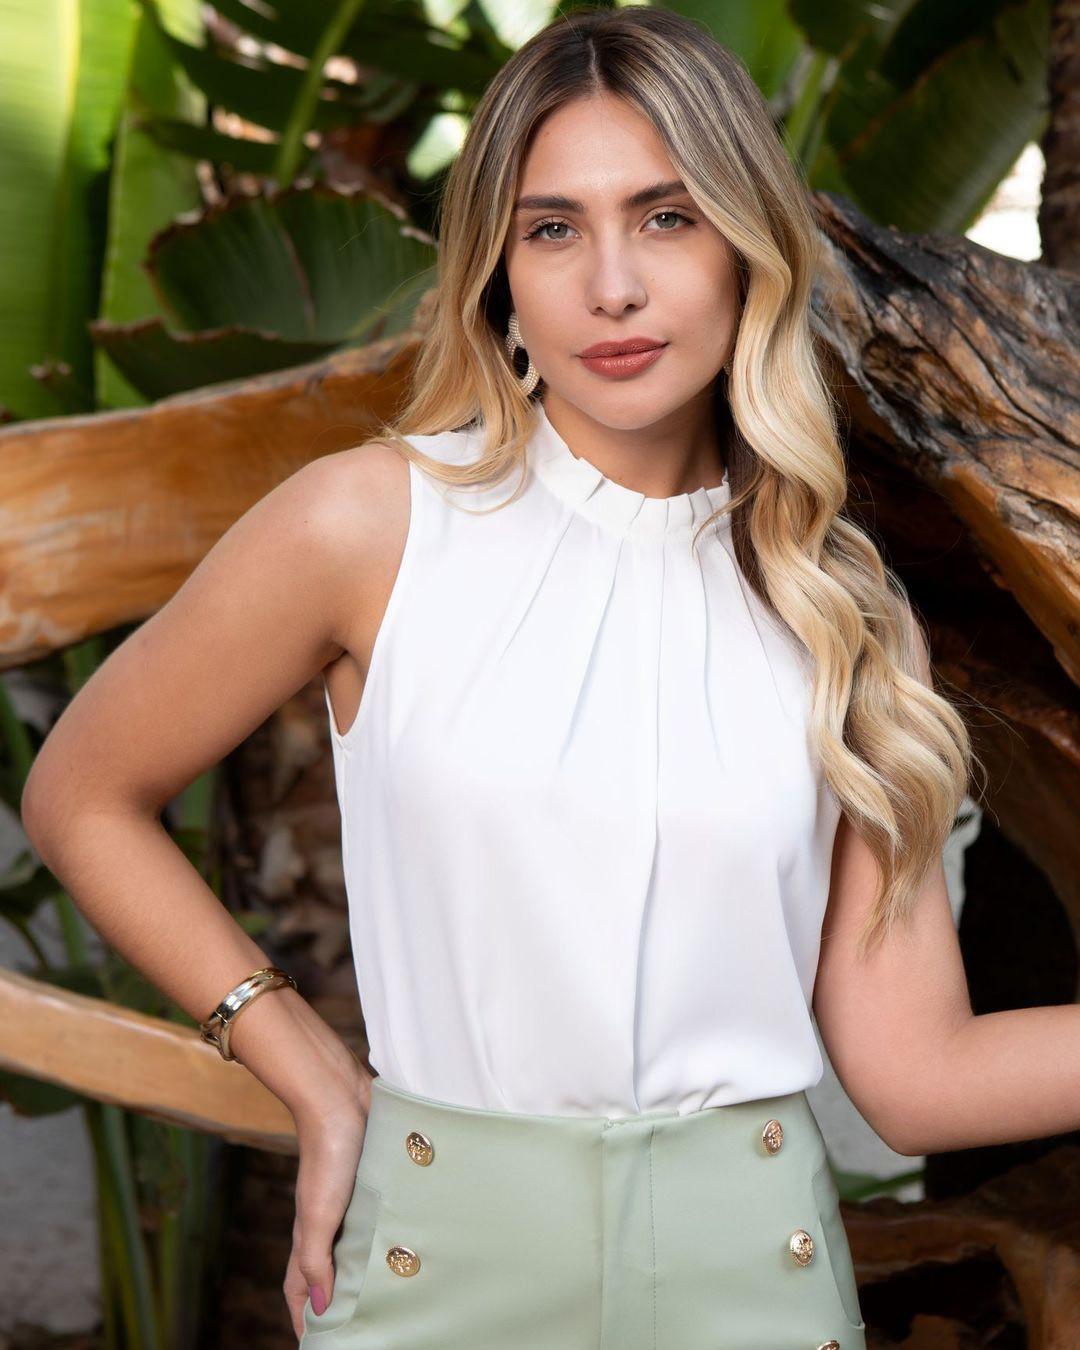 Blusa Regata Básica Crepe Gola Alta com Pregas Unique Chic